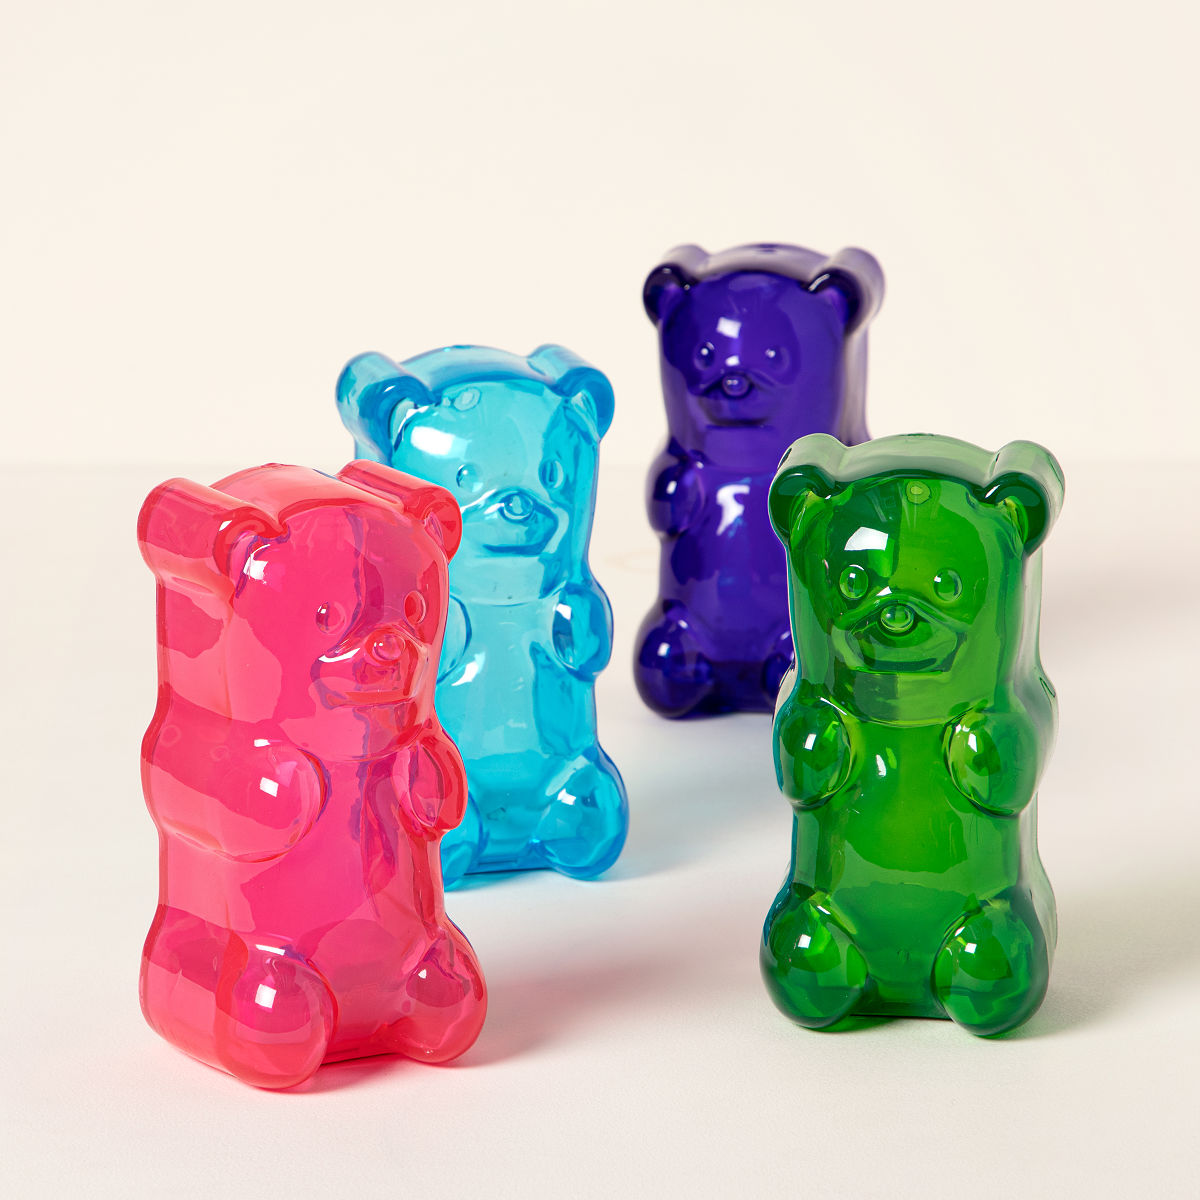 Gummy Bear Lights | Gummi Bear Lamp, Nightlight | UncommonGoods